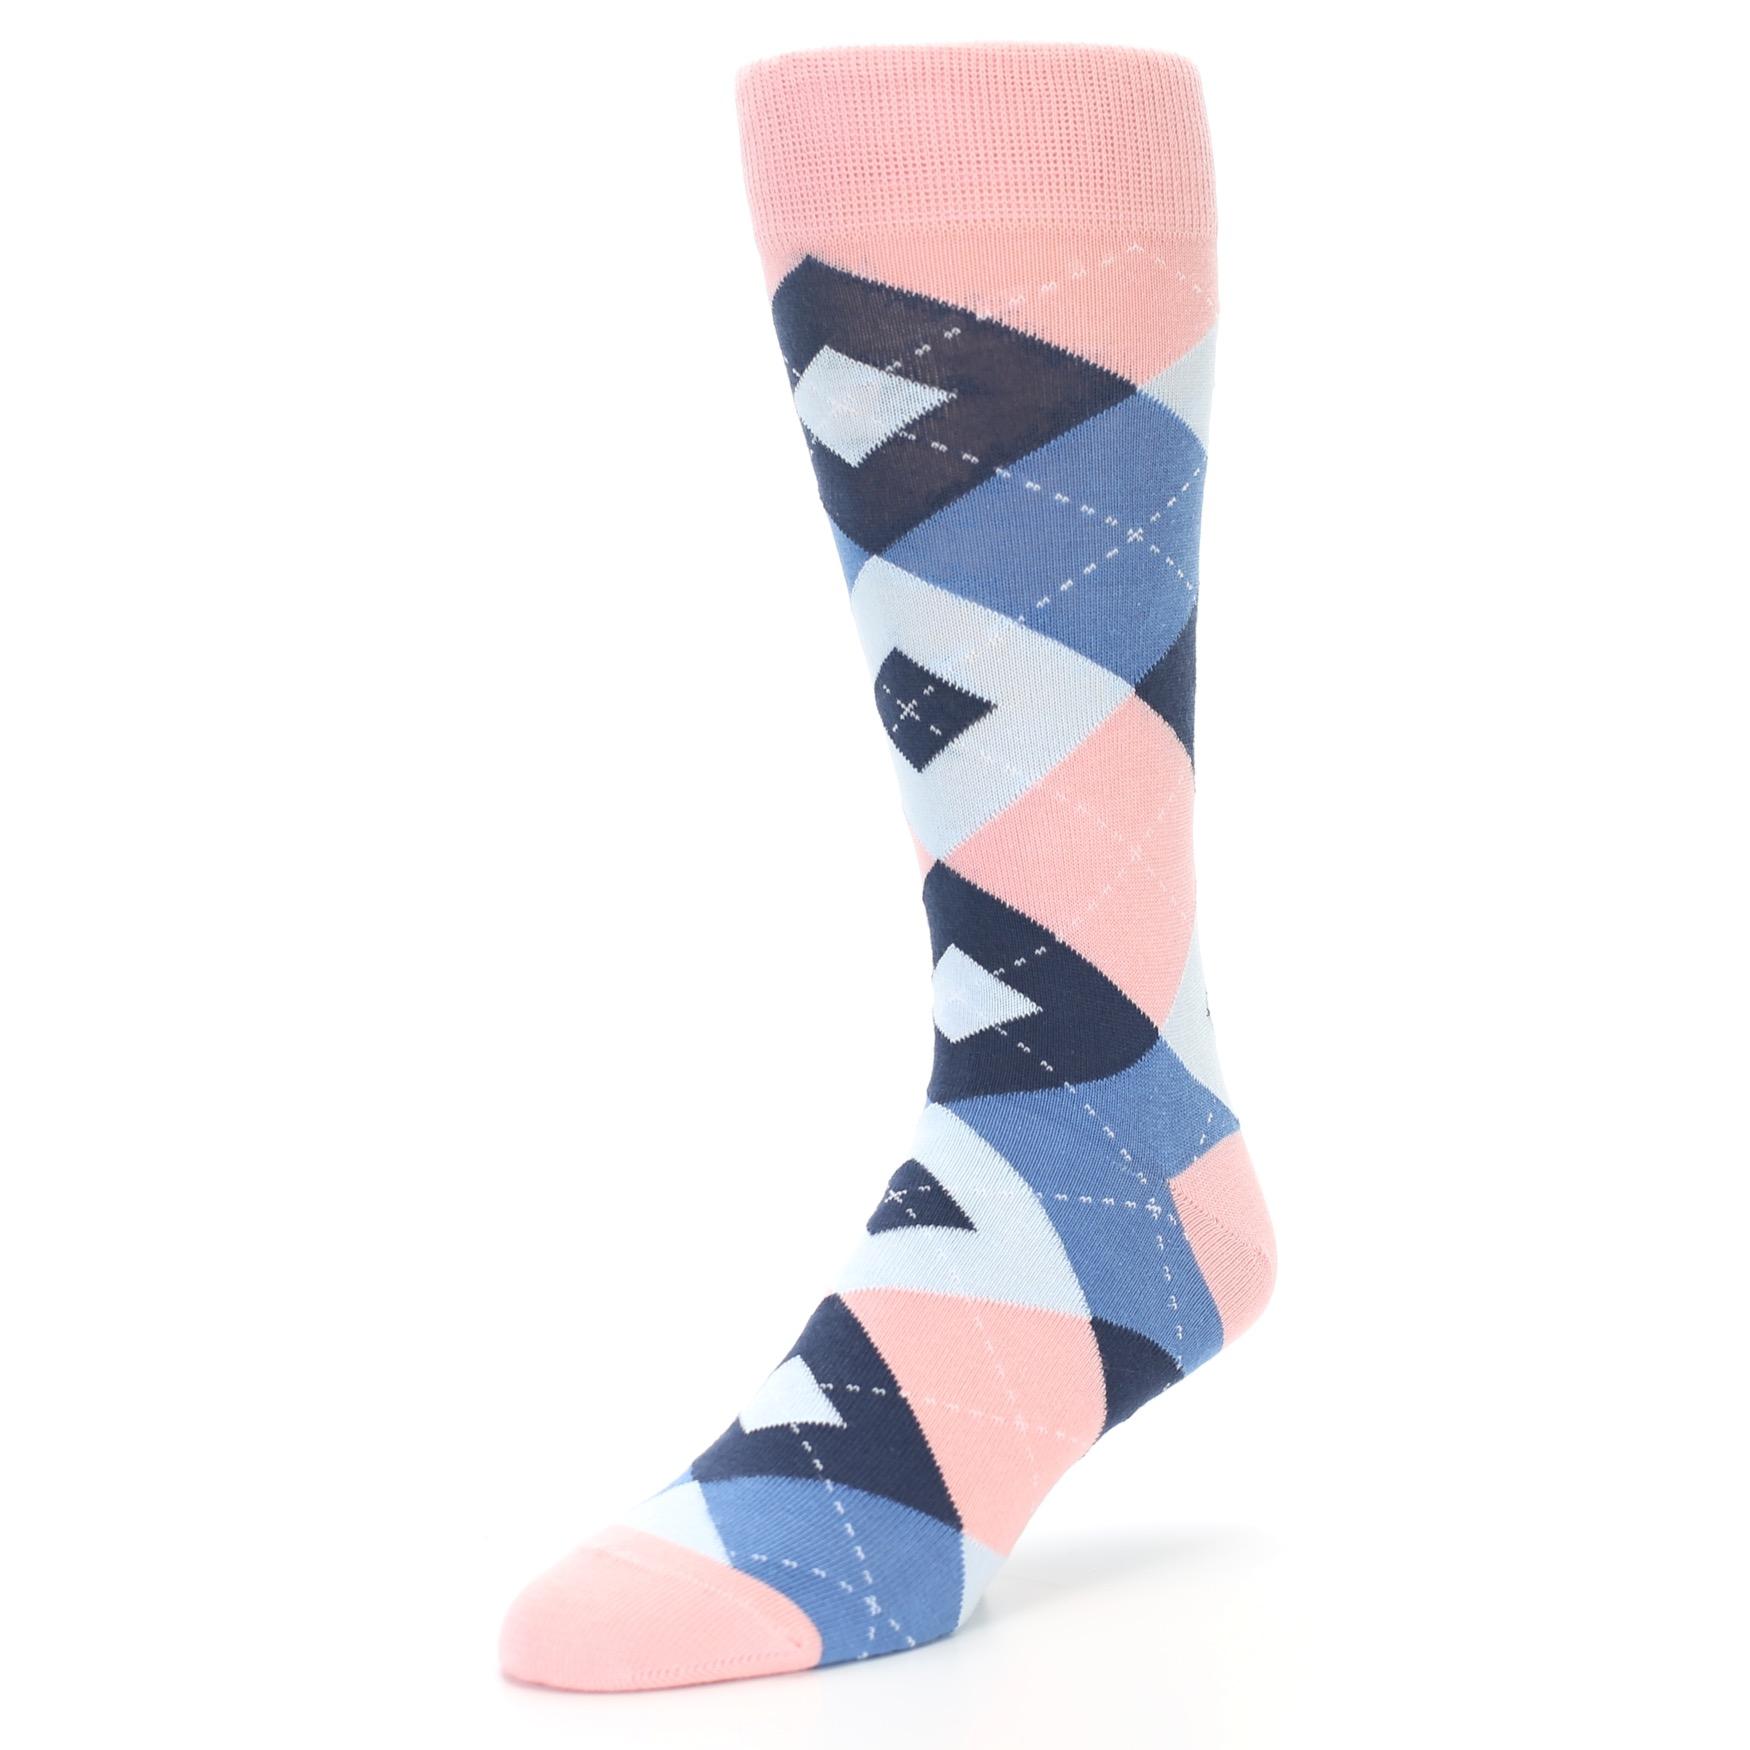 Pink Blue Argyle Wedding Groomsmen Men's Dress Socks